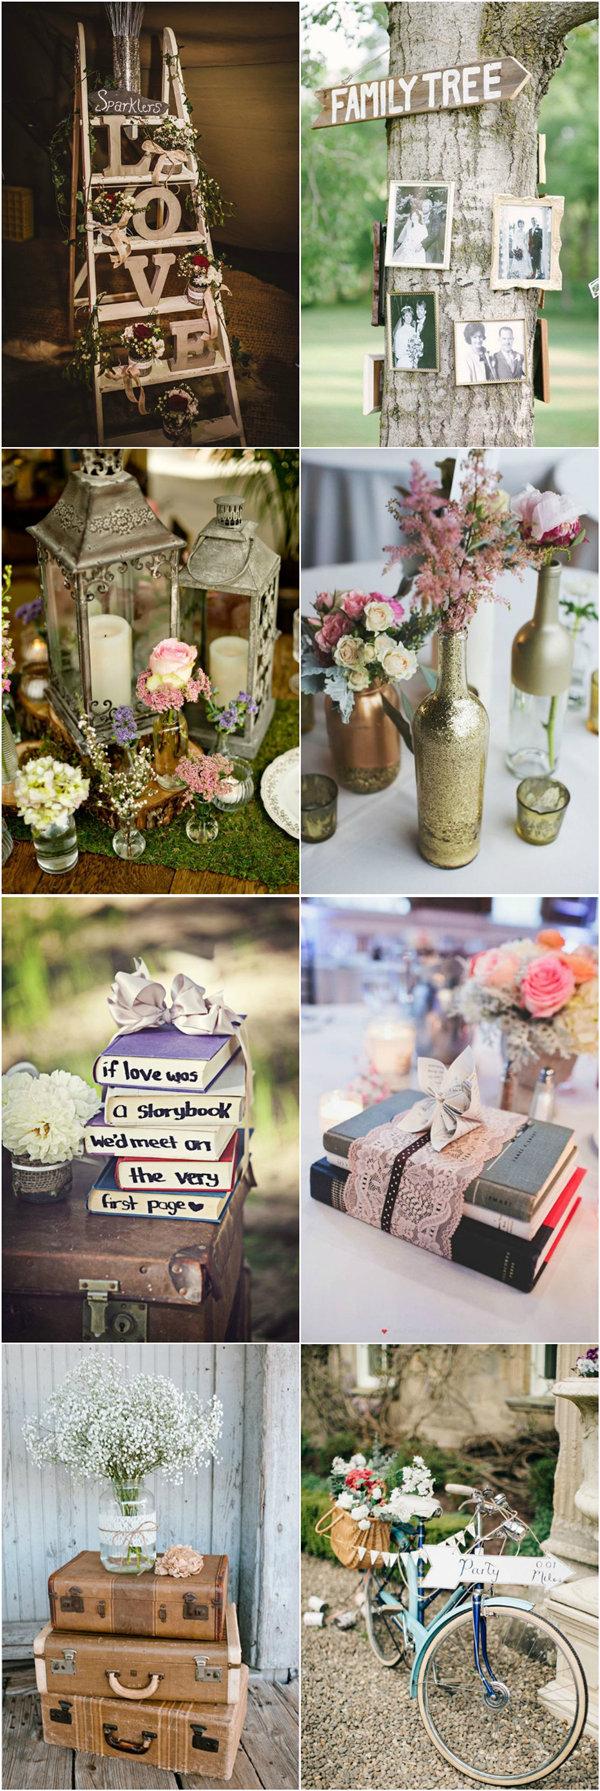 Vintage Wedding Ideas 30 Stunning Vintage Wedding Ideas For Springsummer Tulle